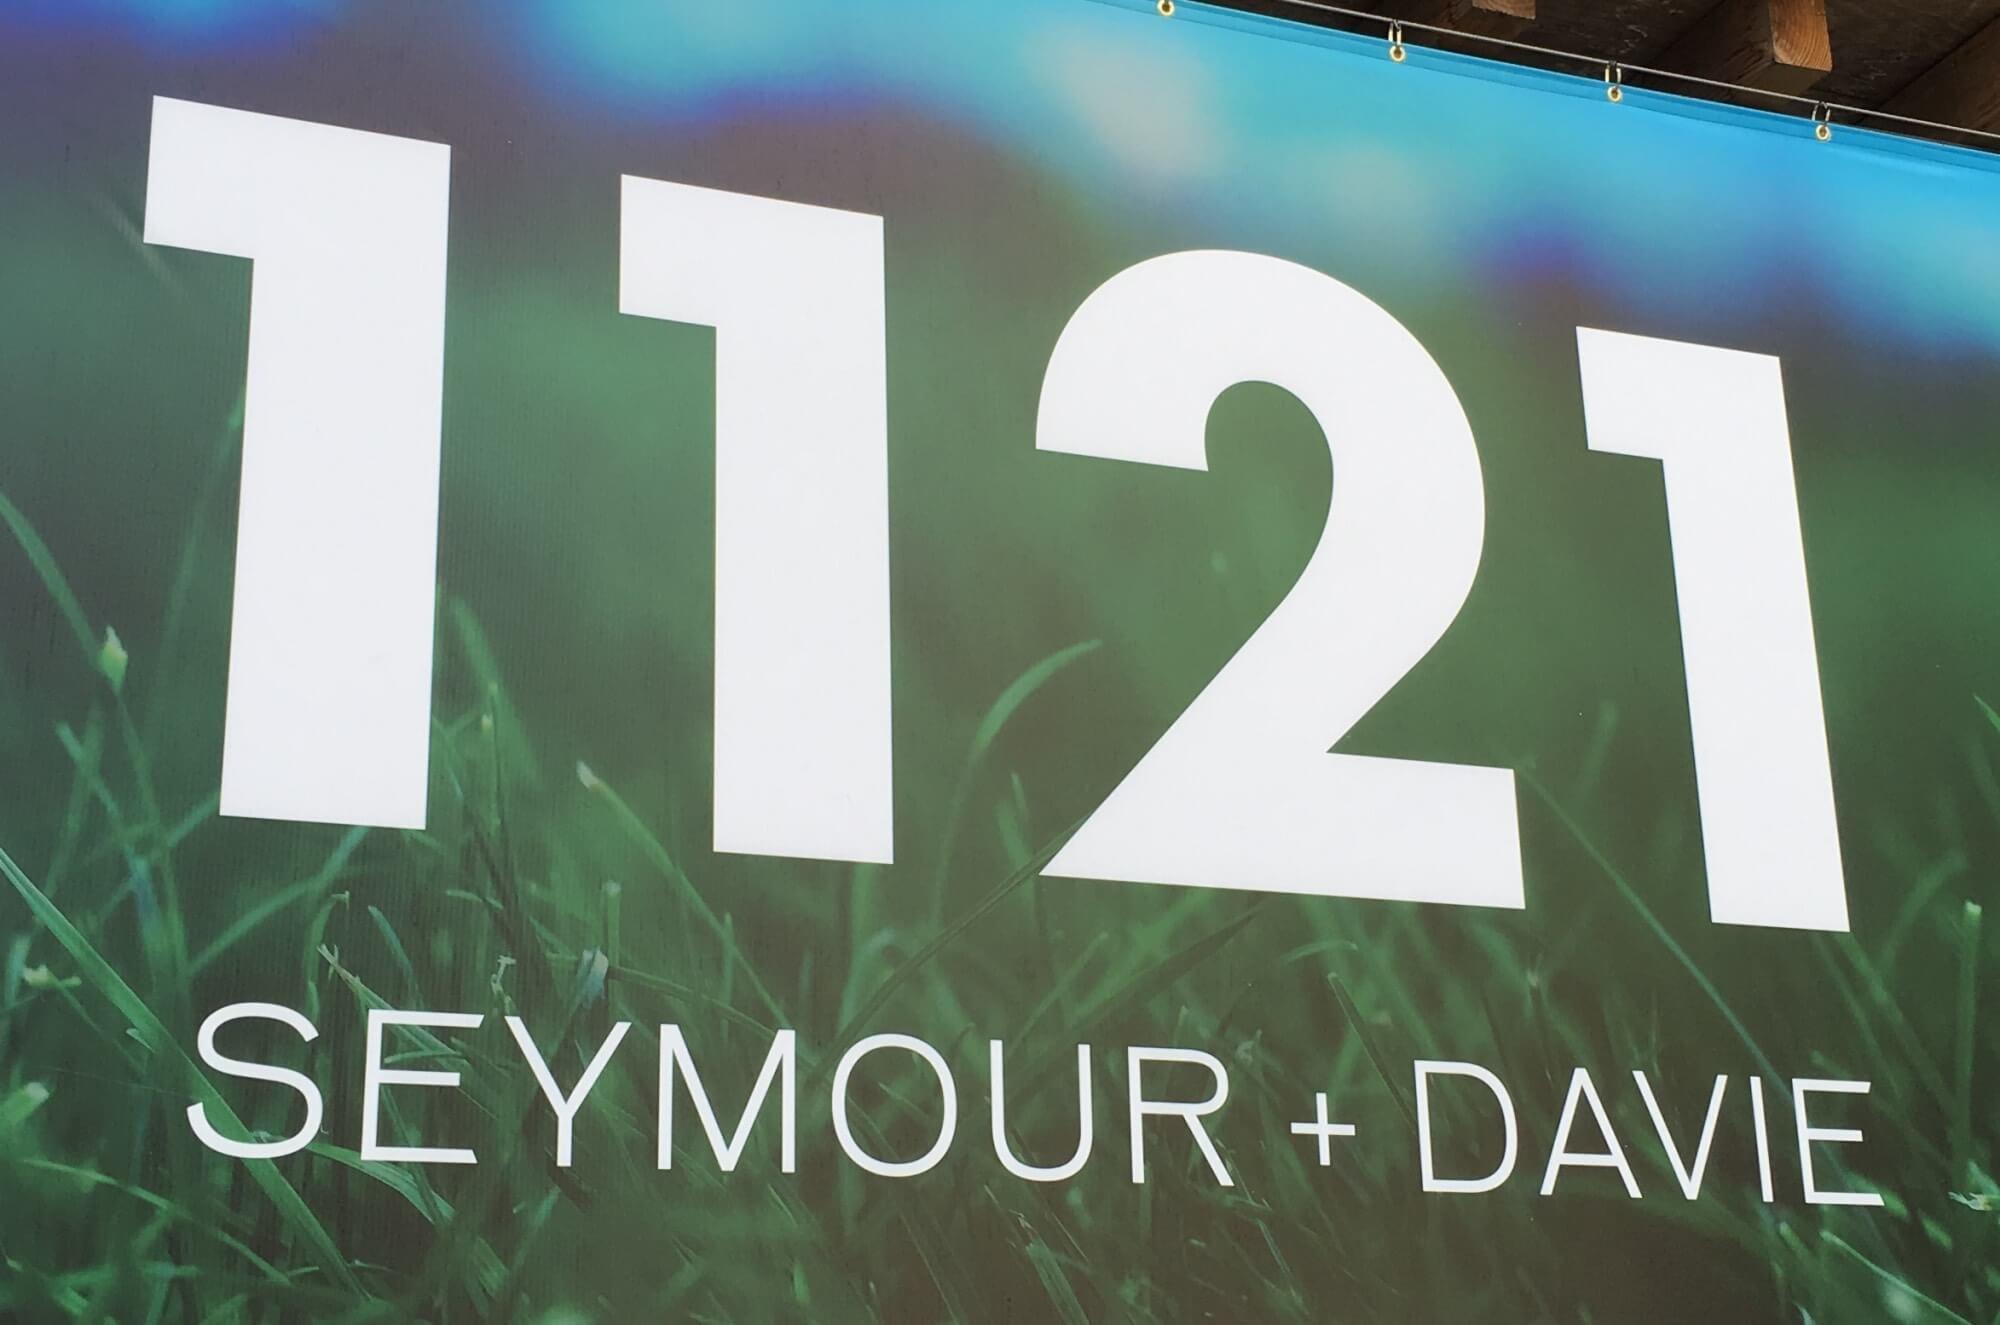 1121 Seymour Street!